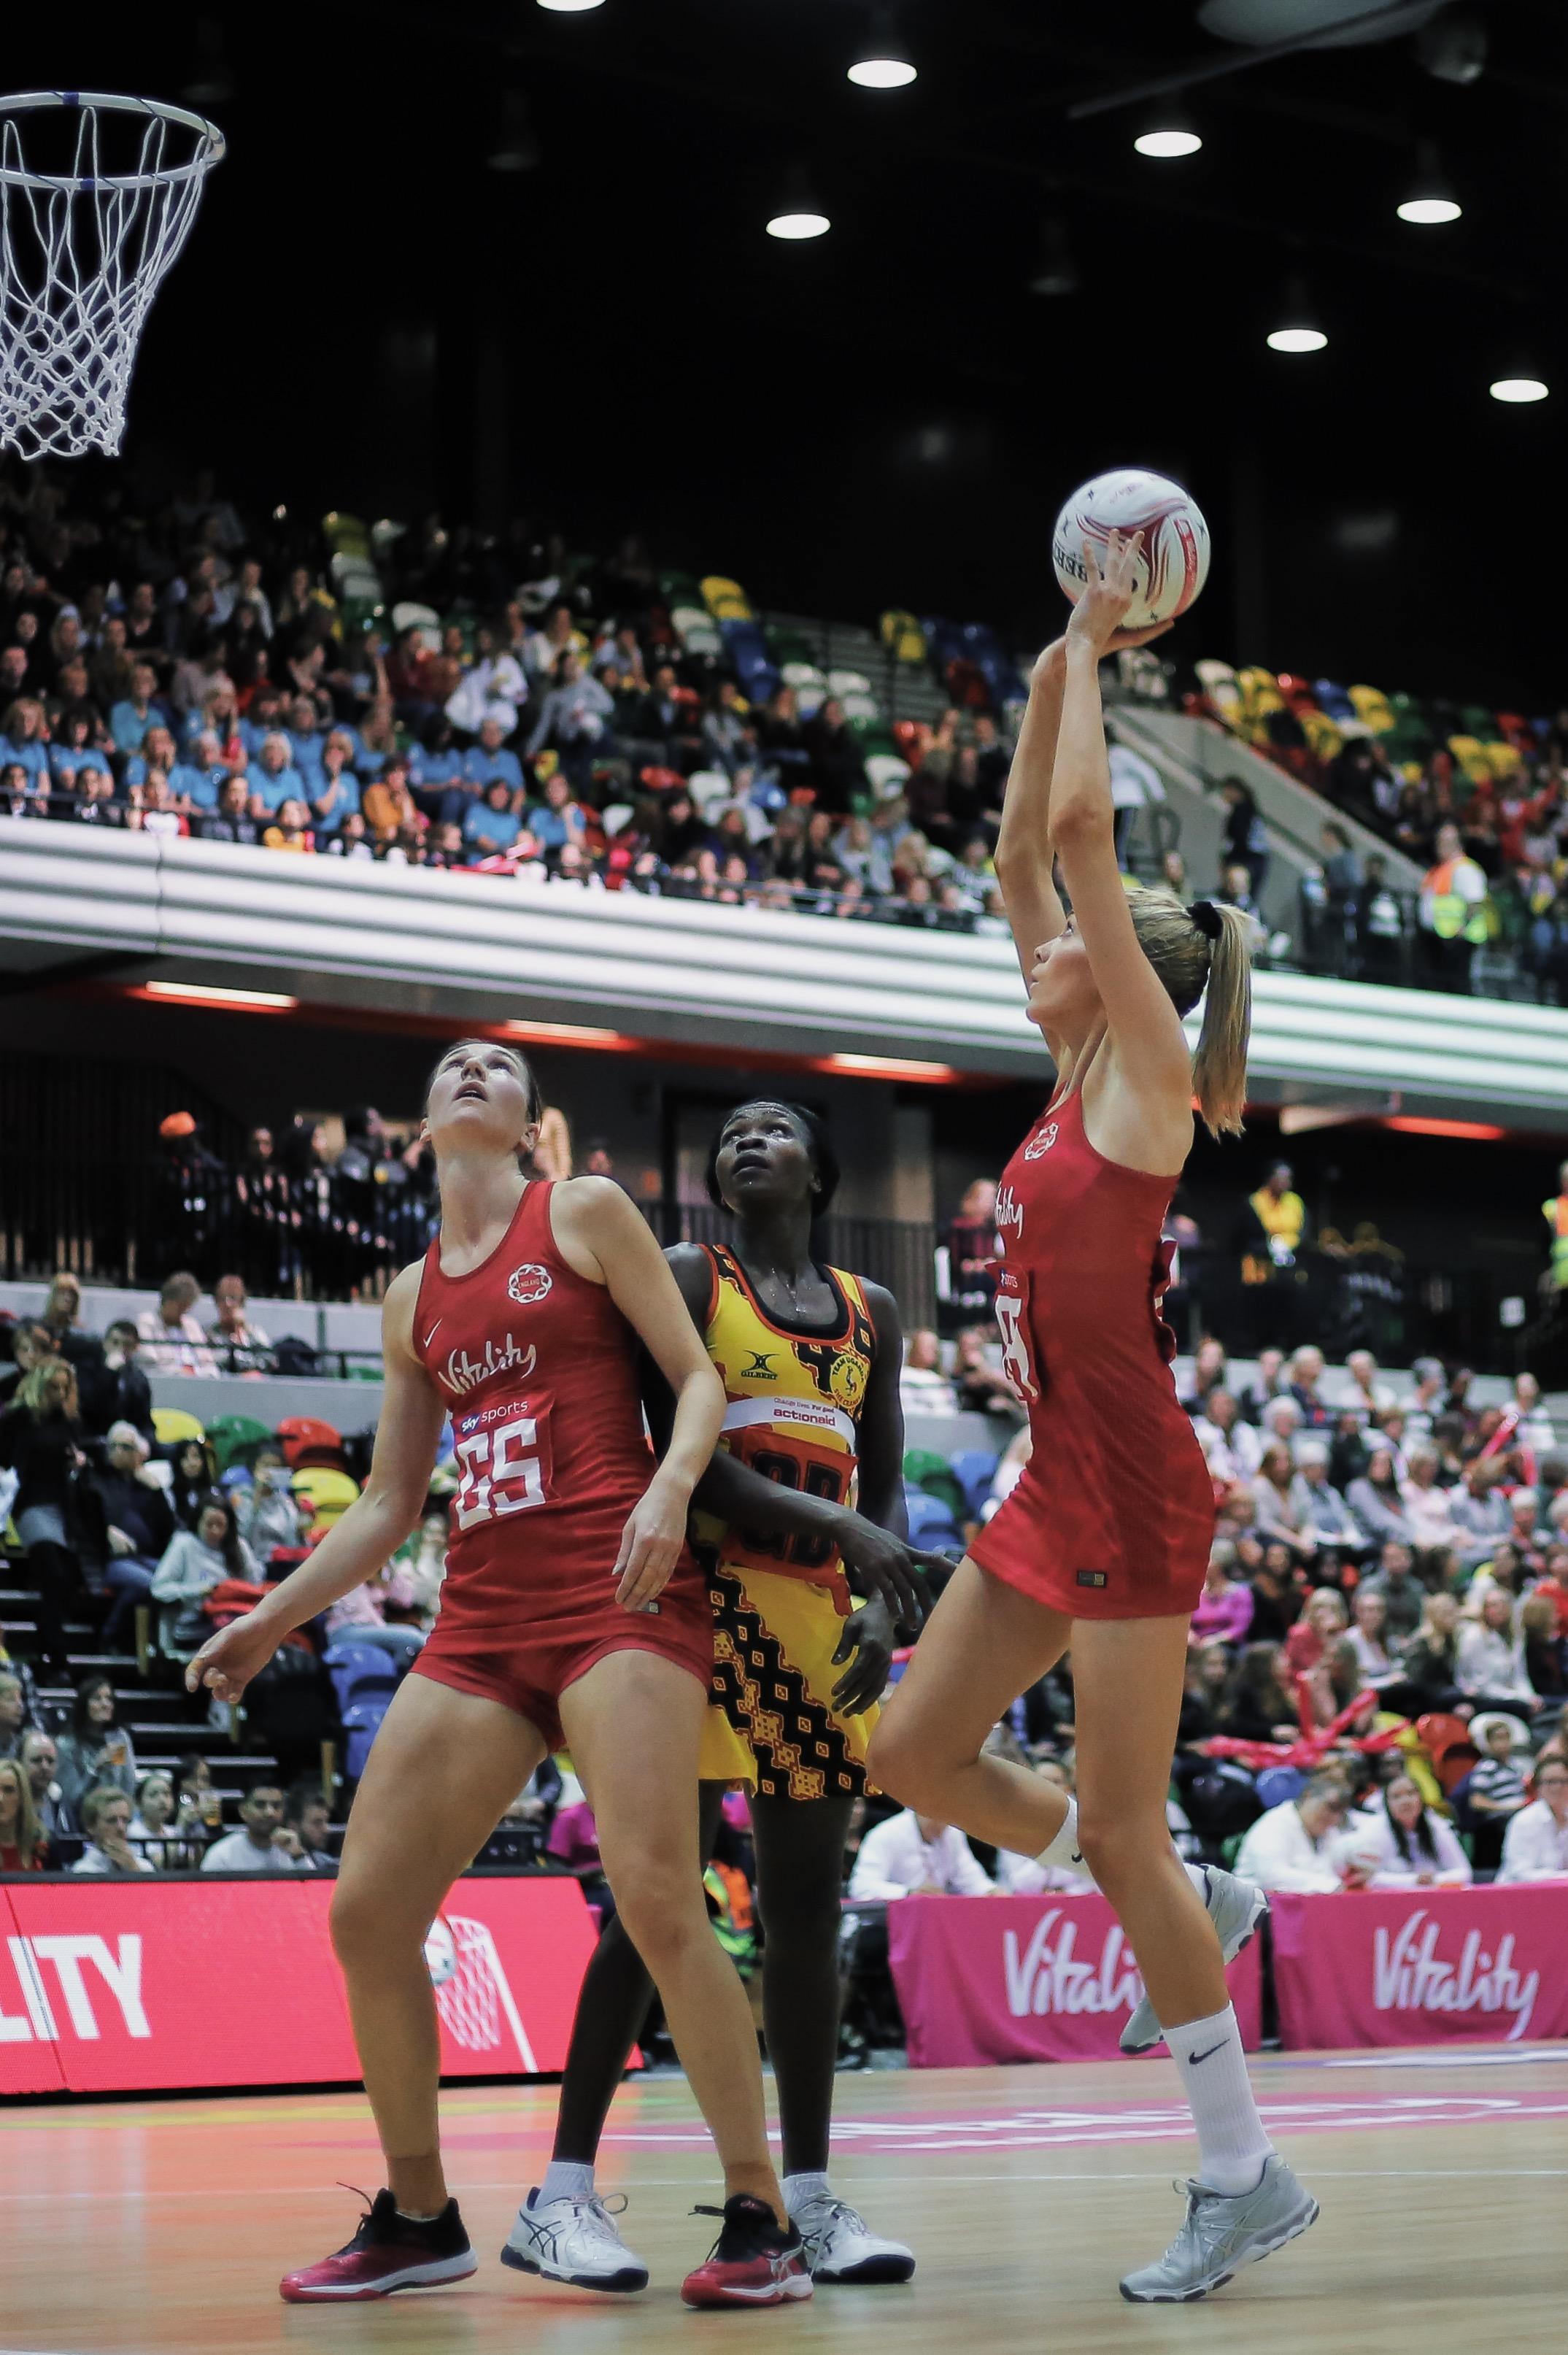 womens-netball-sport-england-uganda-international-series-07.jpg